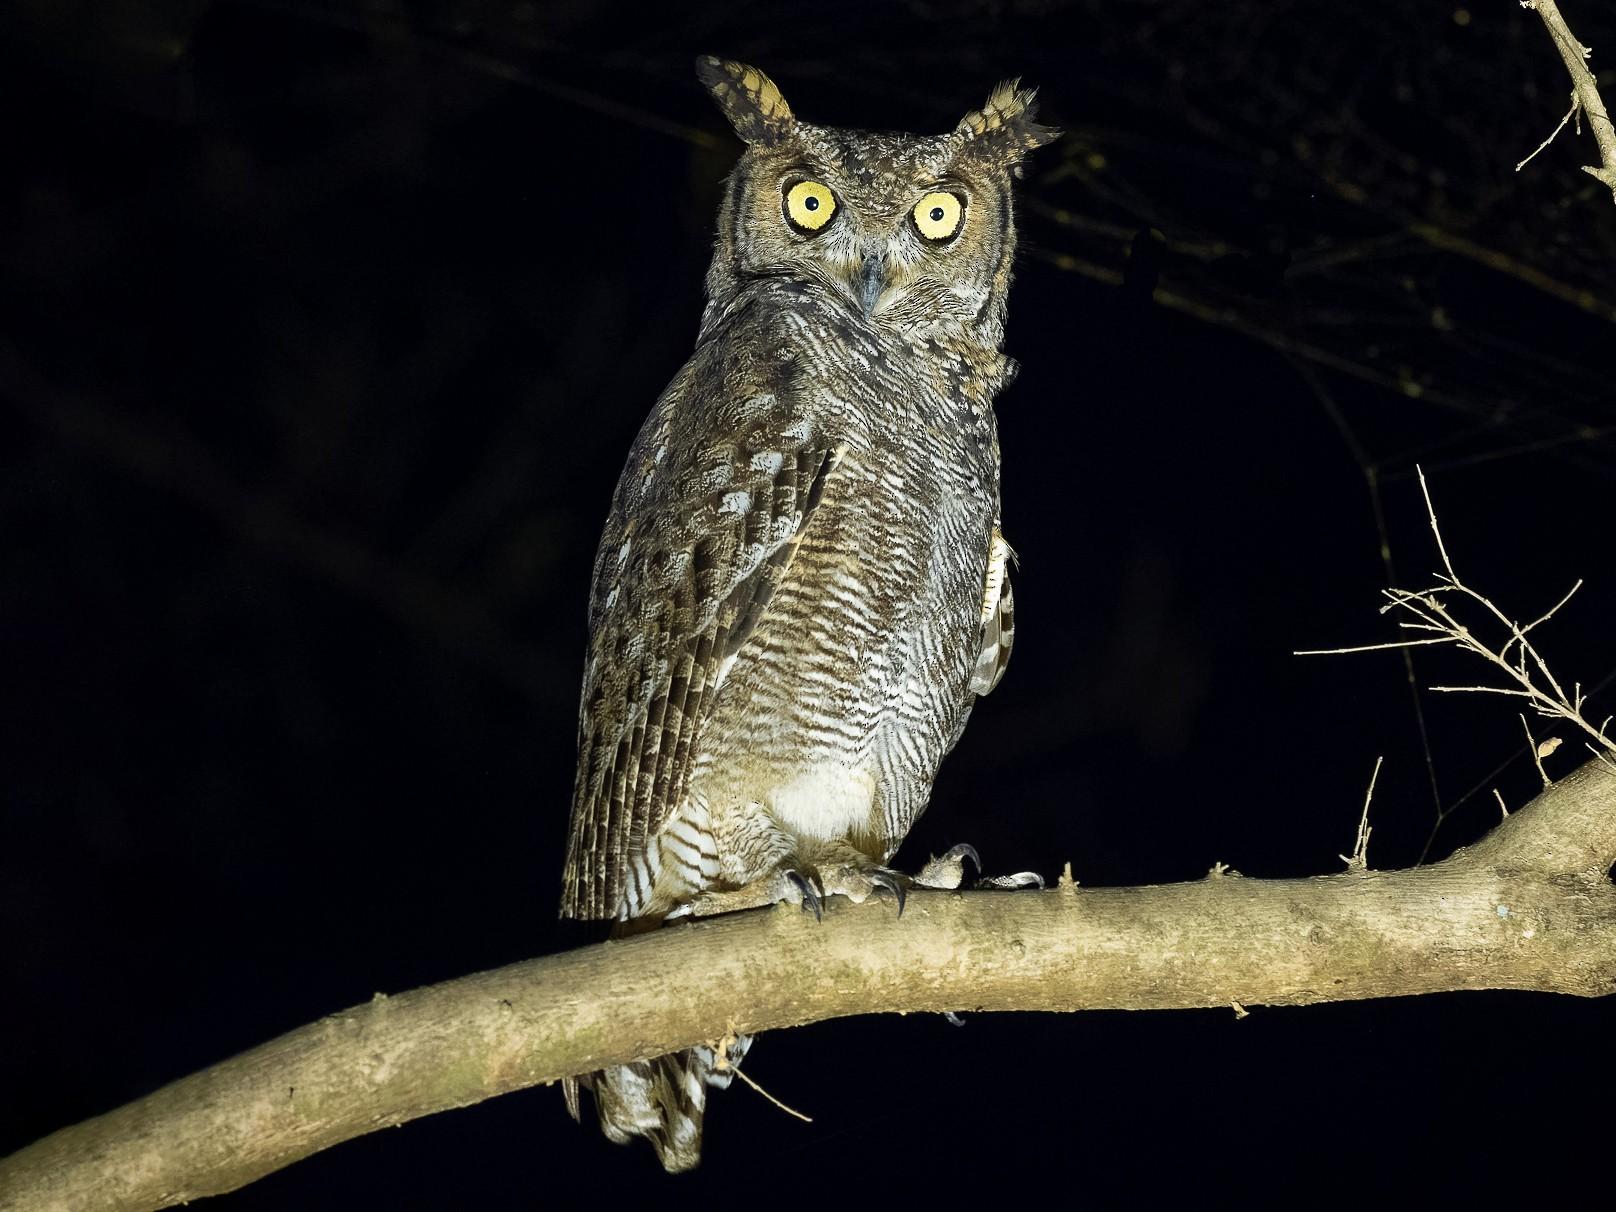 Arabian Eagle-Owl - Matti Rekilä